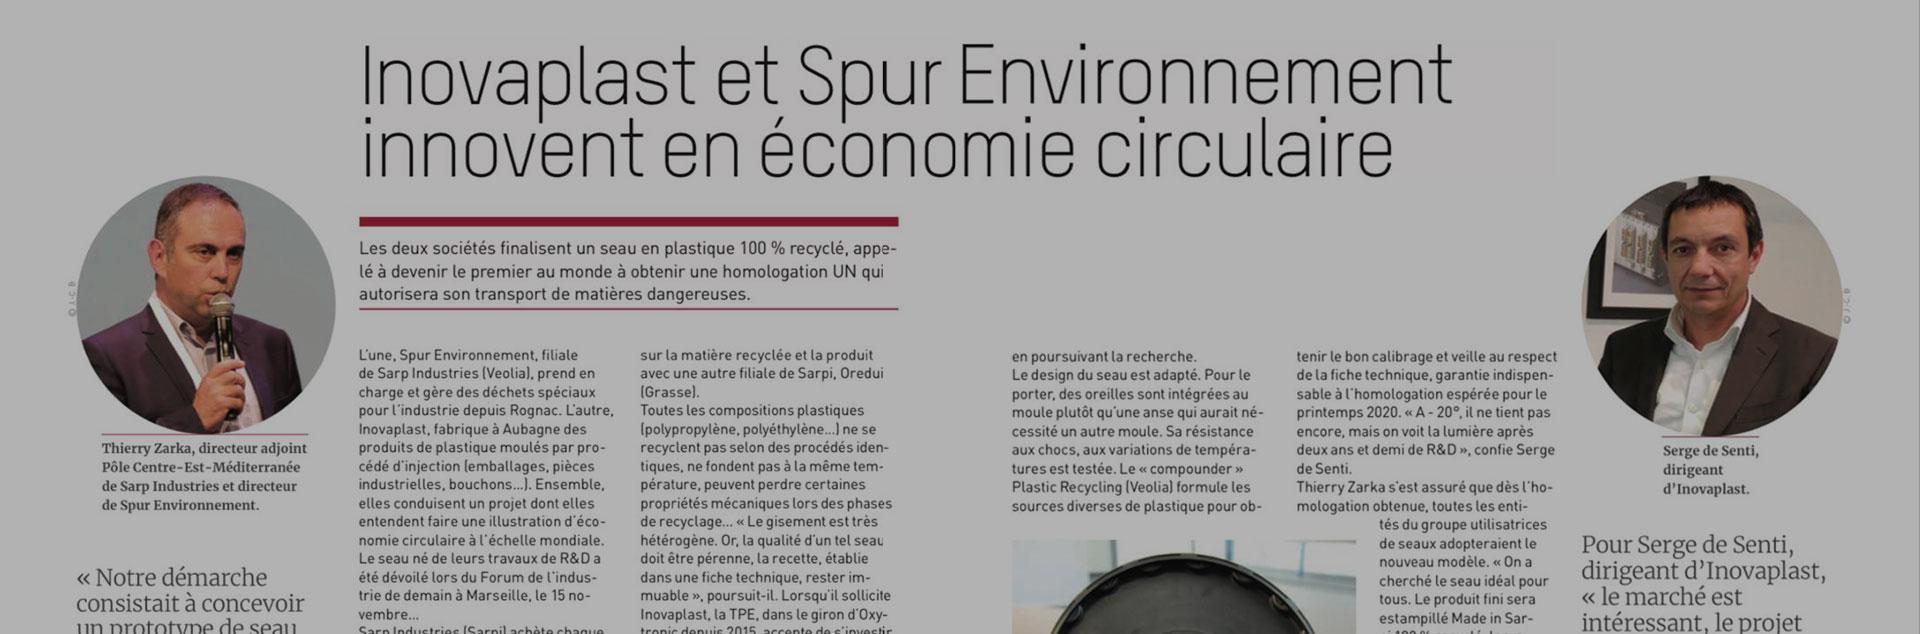 Innovation & économie circulaire.